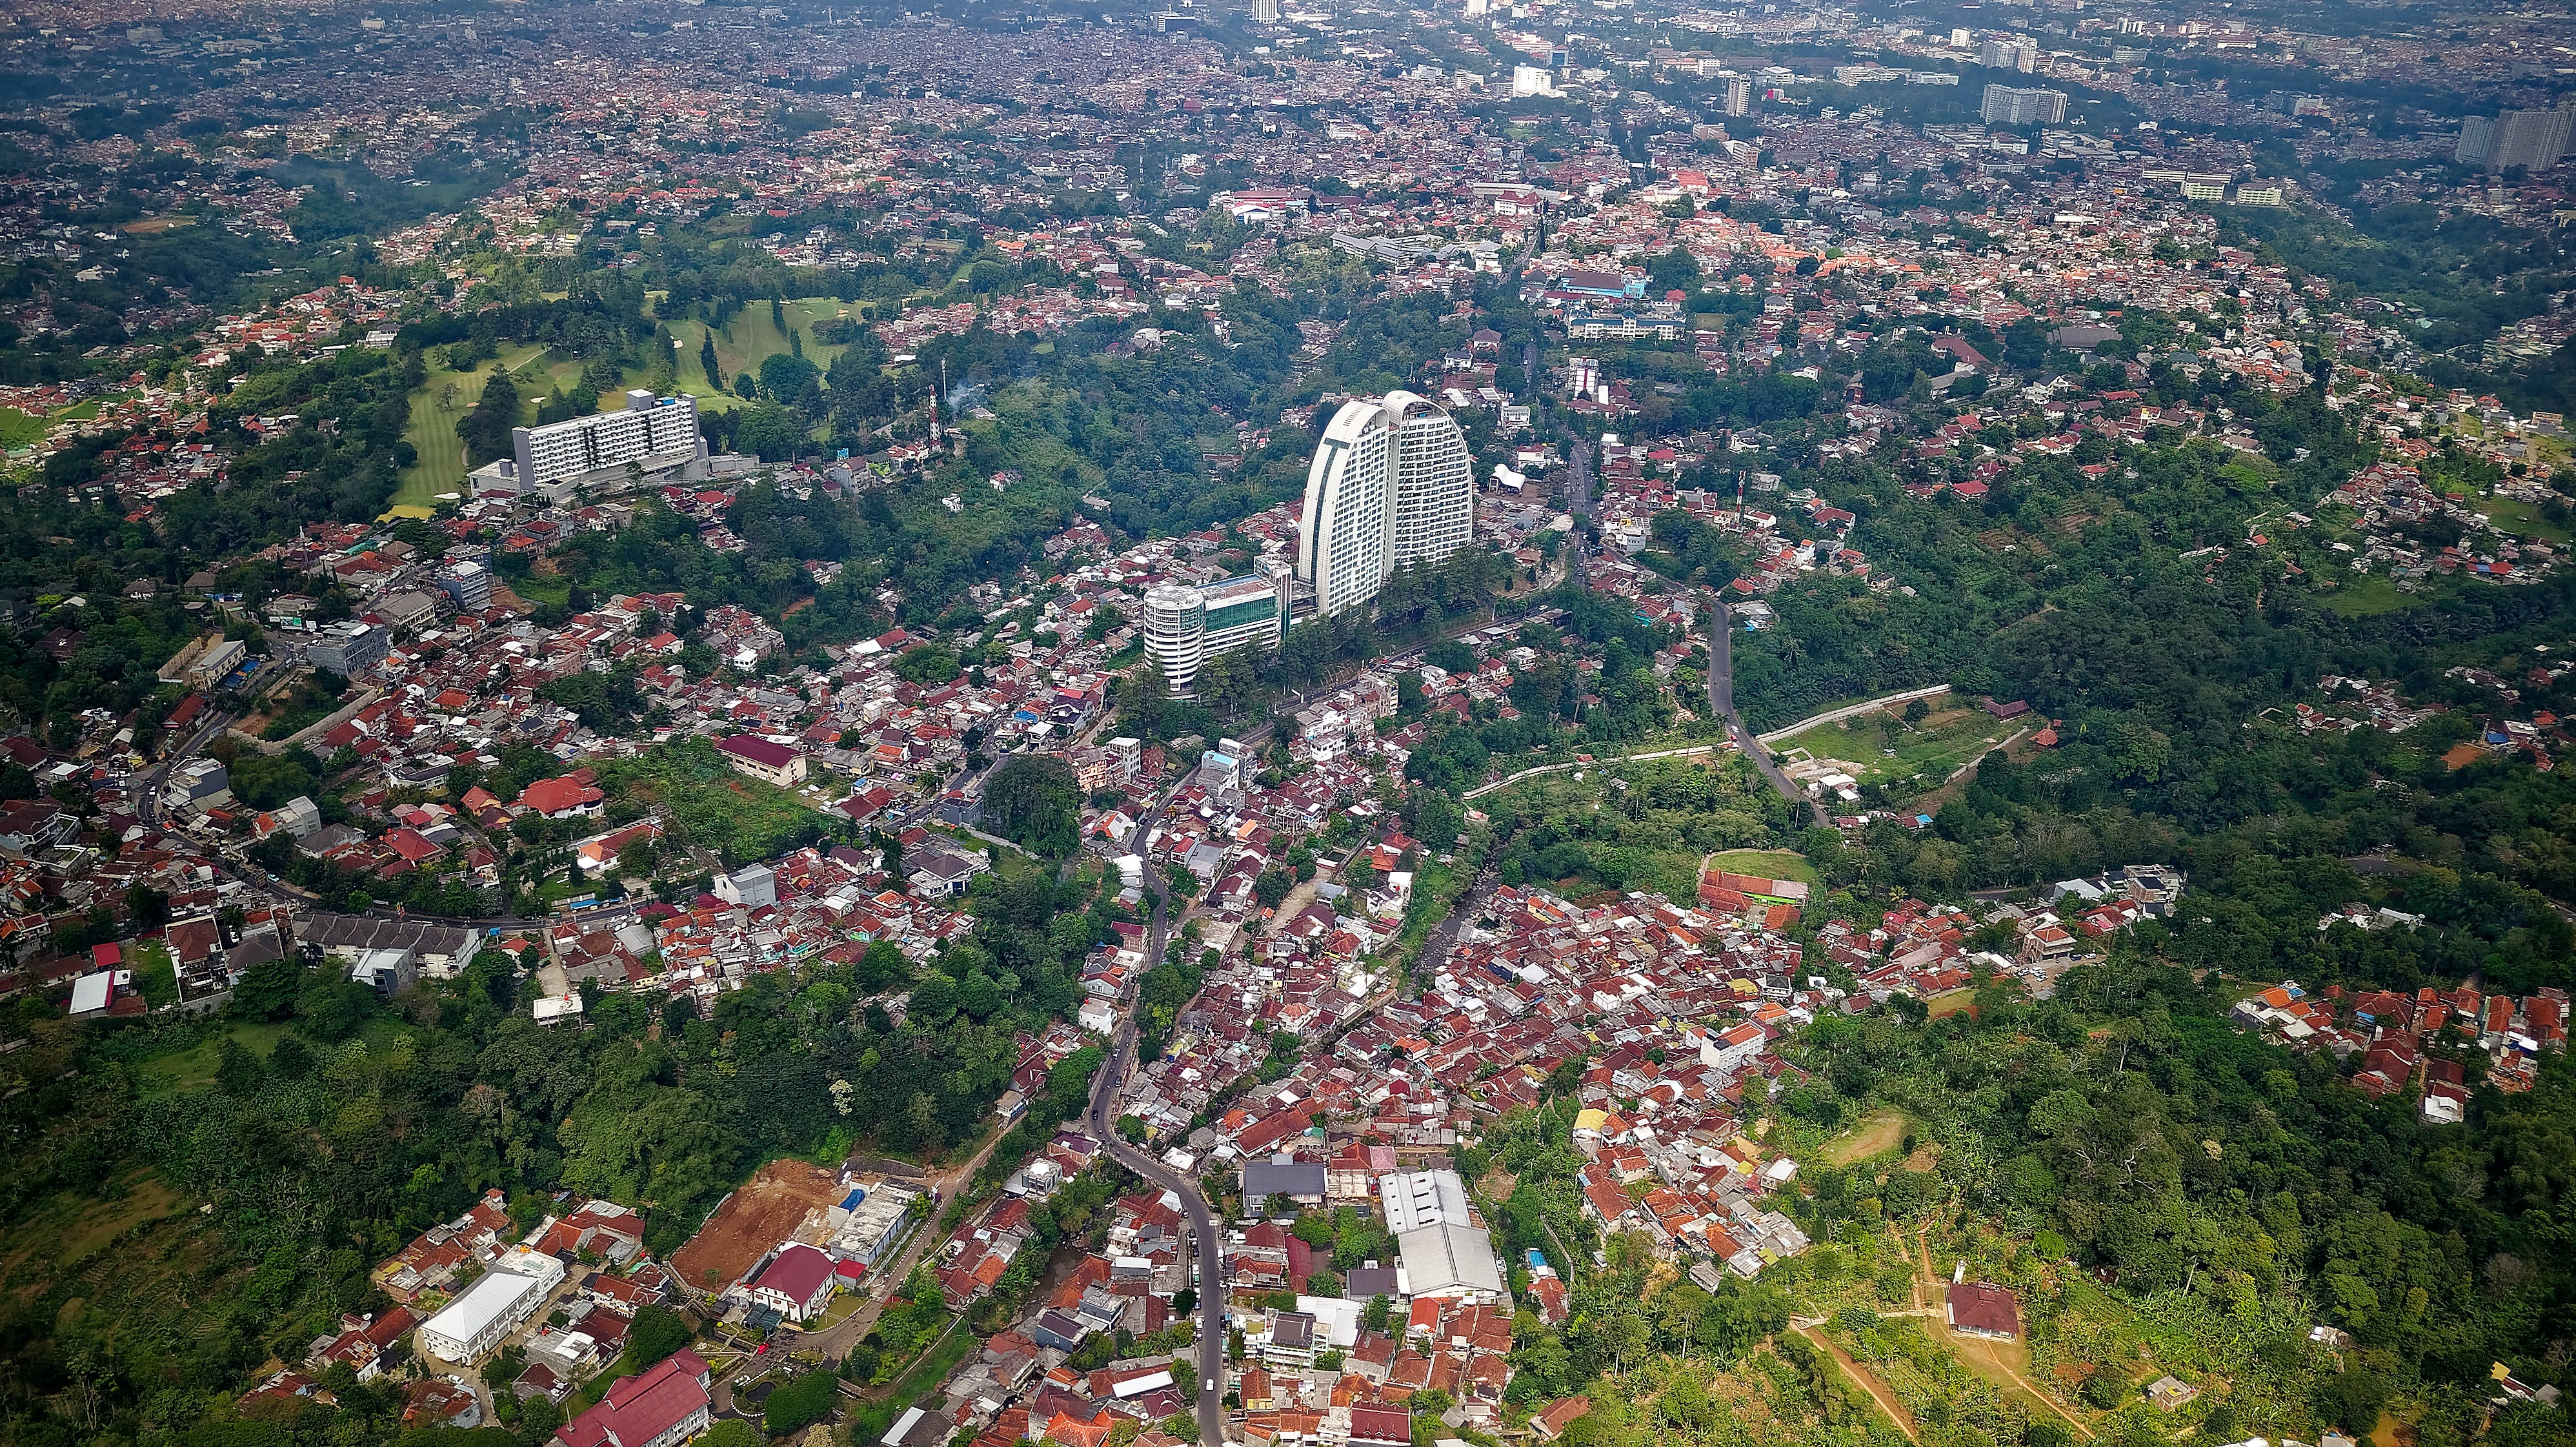 Free stock photo of city, bird's eye view, landscape, houses